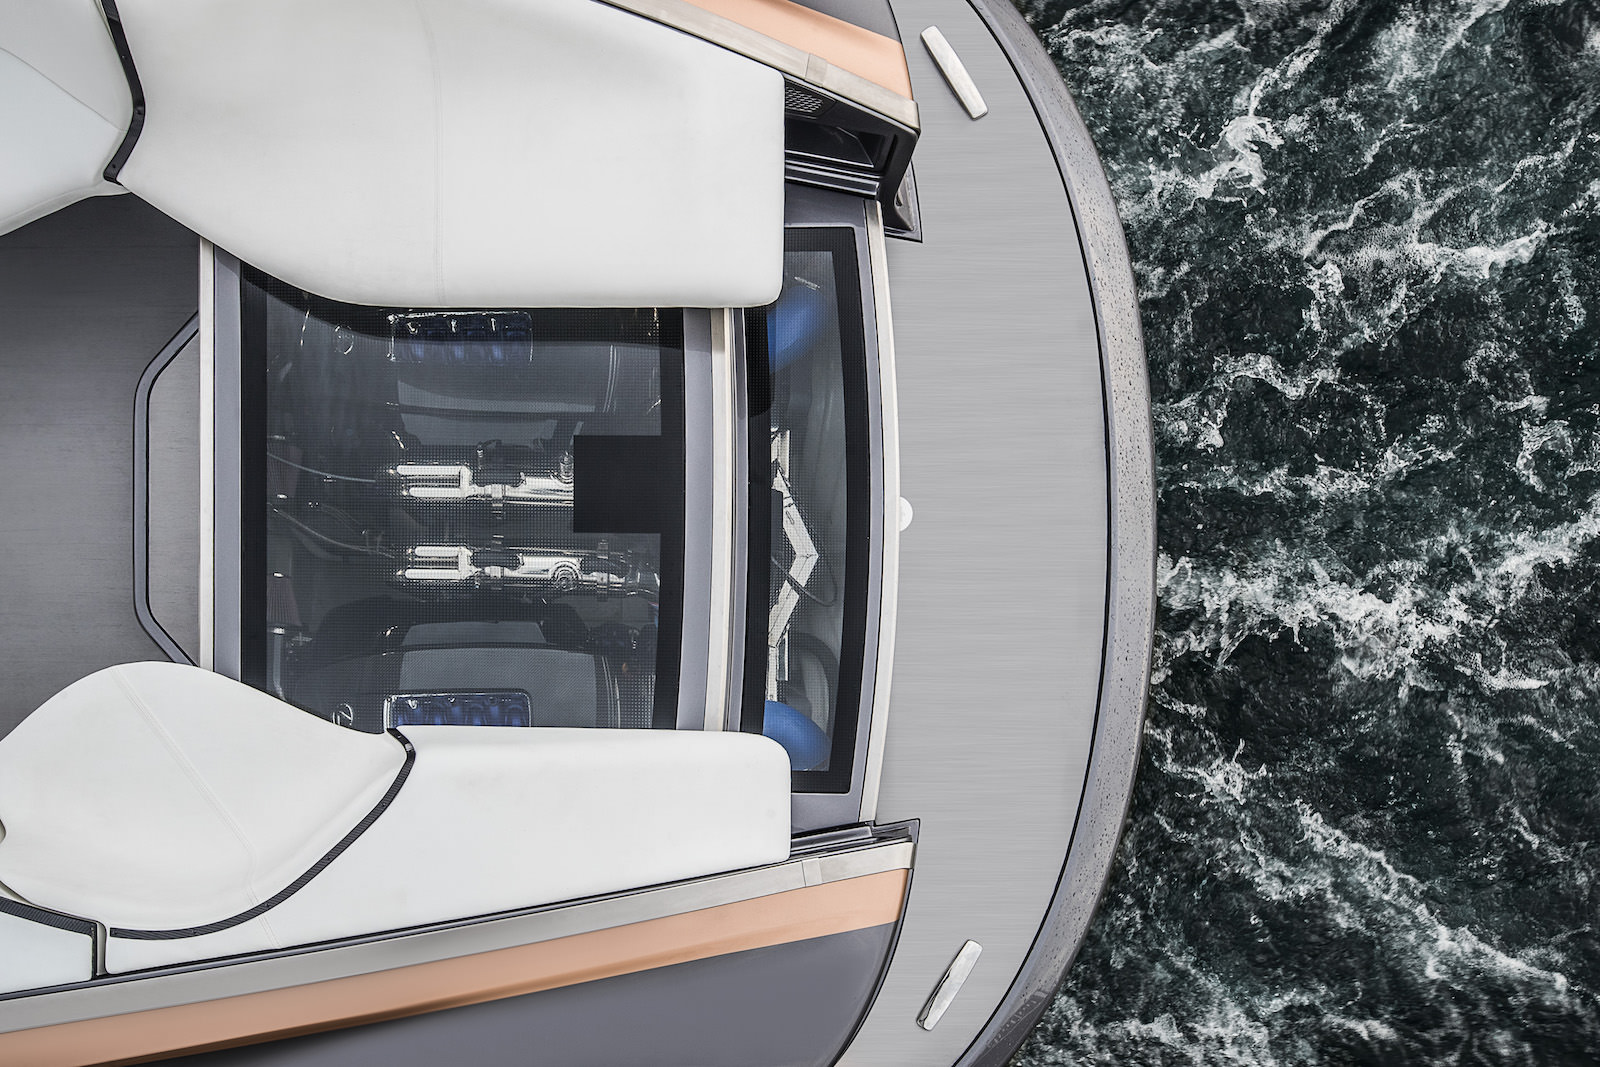 Lexus_Sport_Yacht_concept_11_D456AE44C0AFAF58AA5AC7144E0B6AA1E0E323B9-1